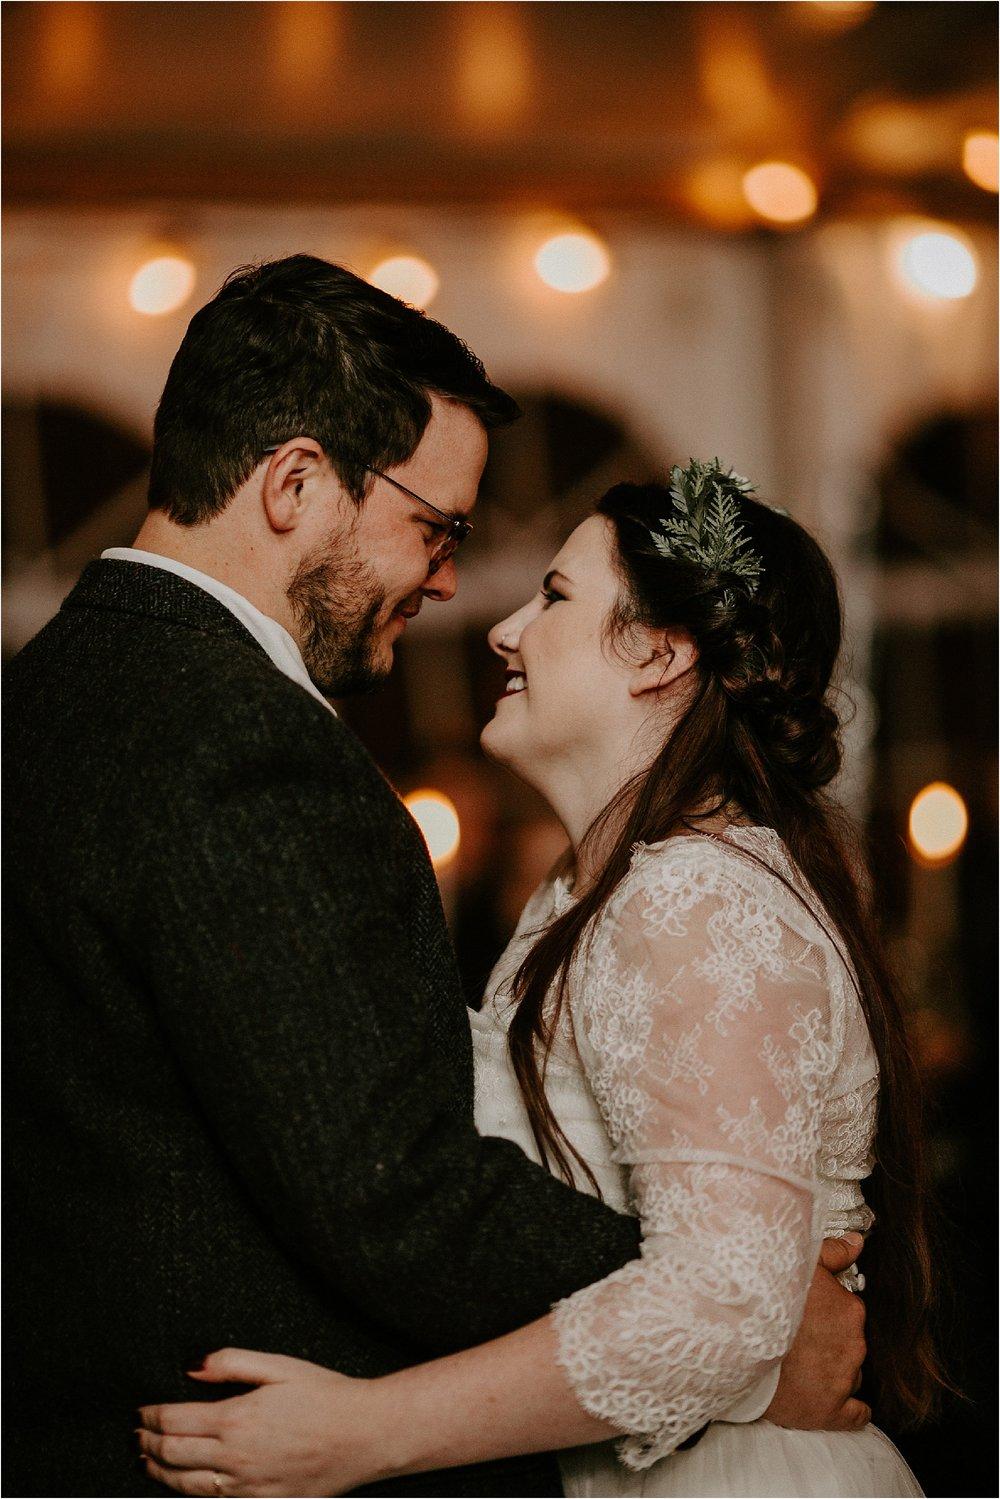 Sarah_Brookhart_Baltimore_Wedding_Photographer_0060.jpg